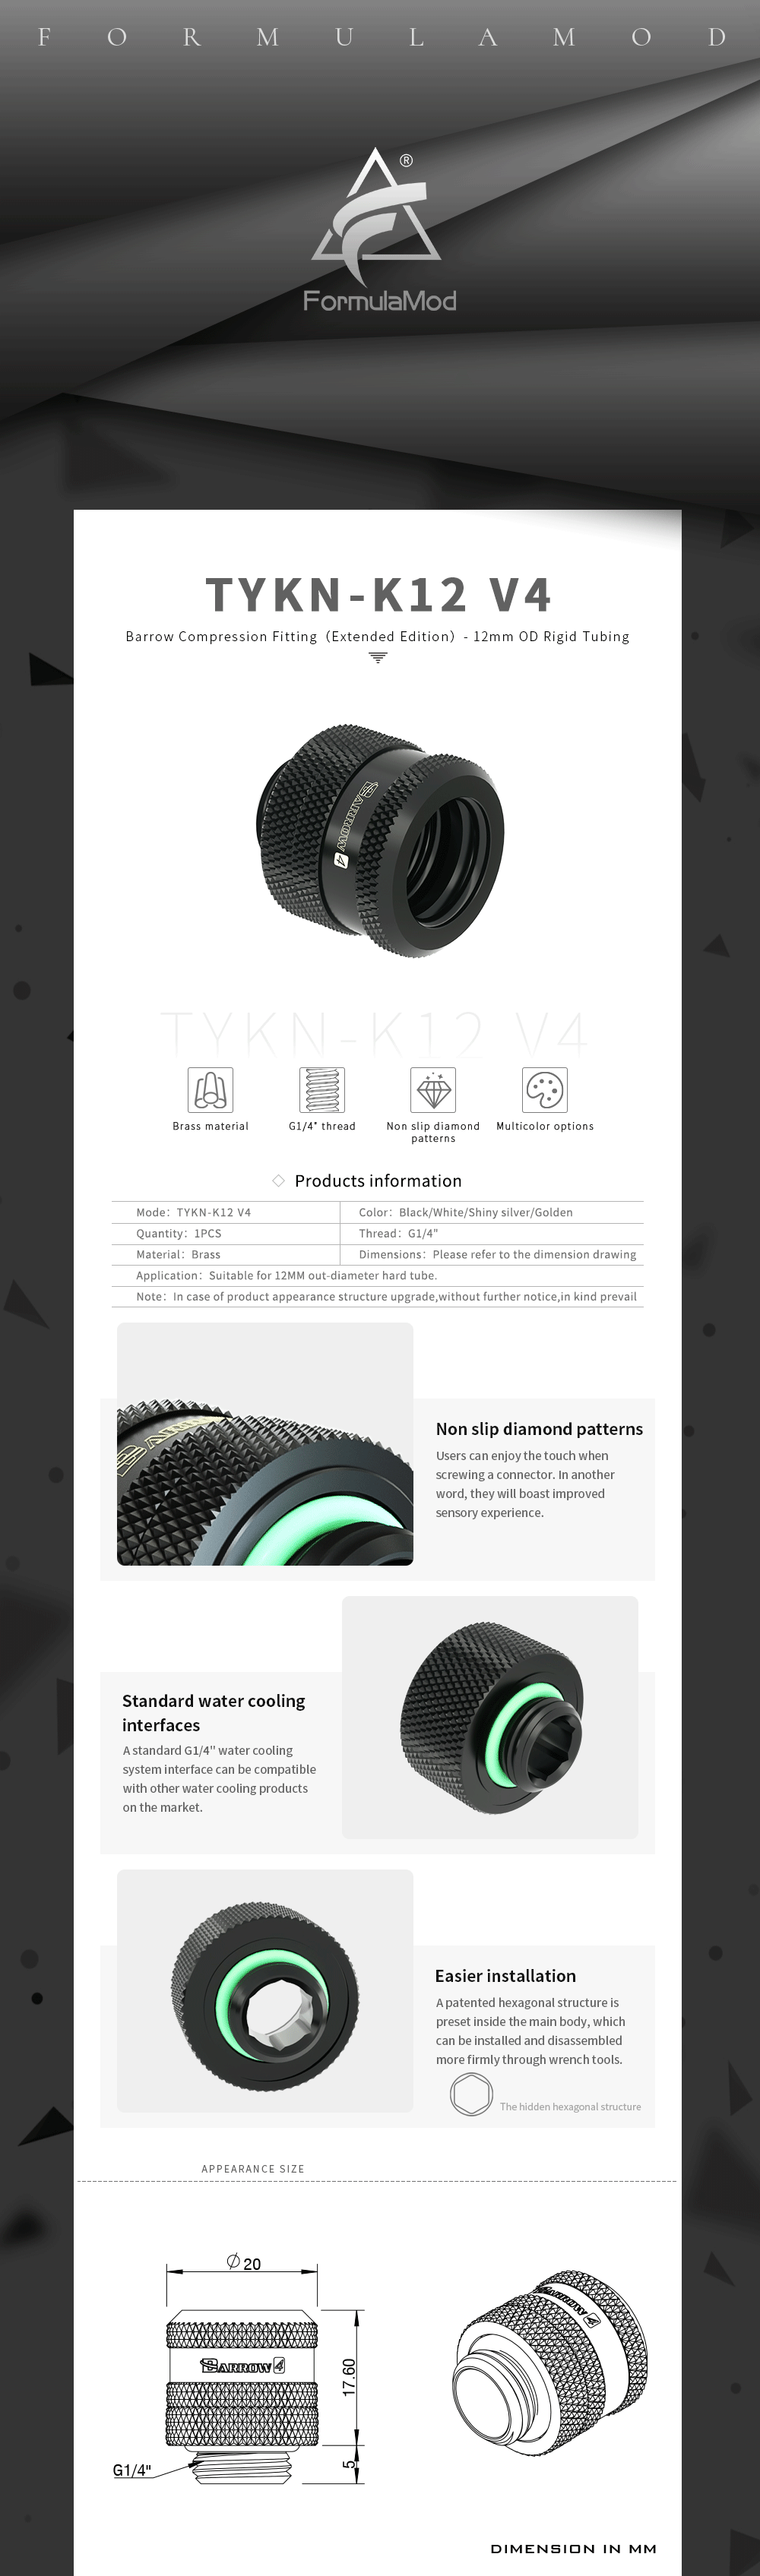 Barrow TYKN-K12 V4, OD12mm Hard Tube Fittings, G1/4 Adapters For OD12mm Hard Tubes